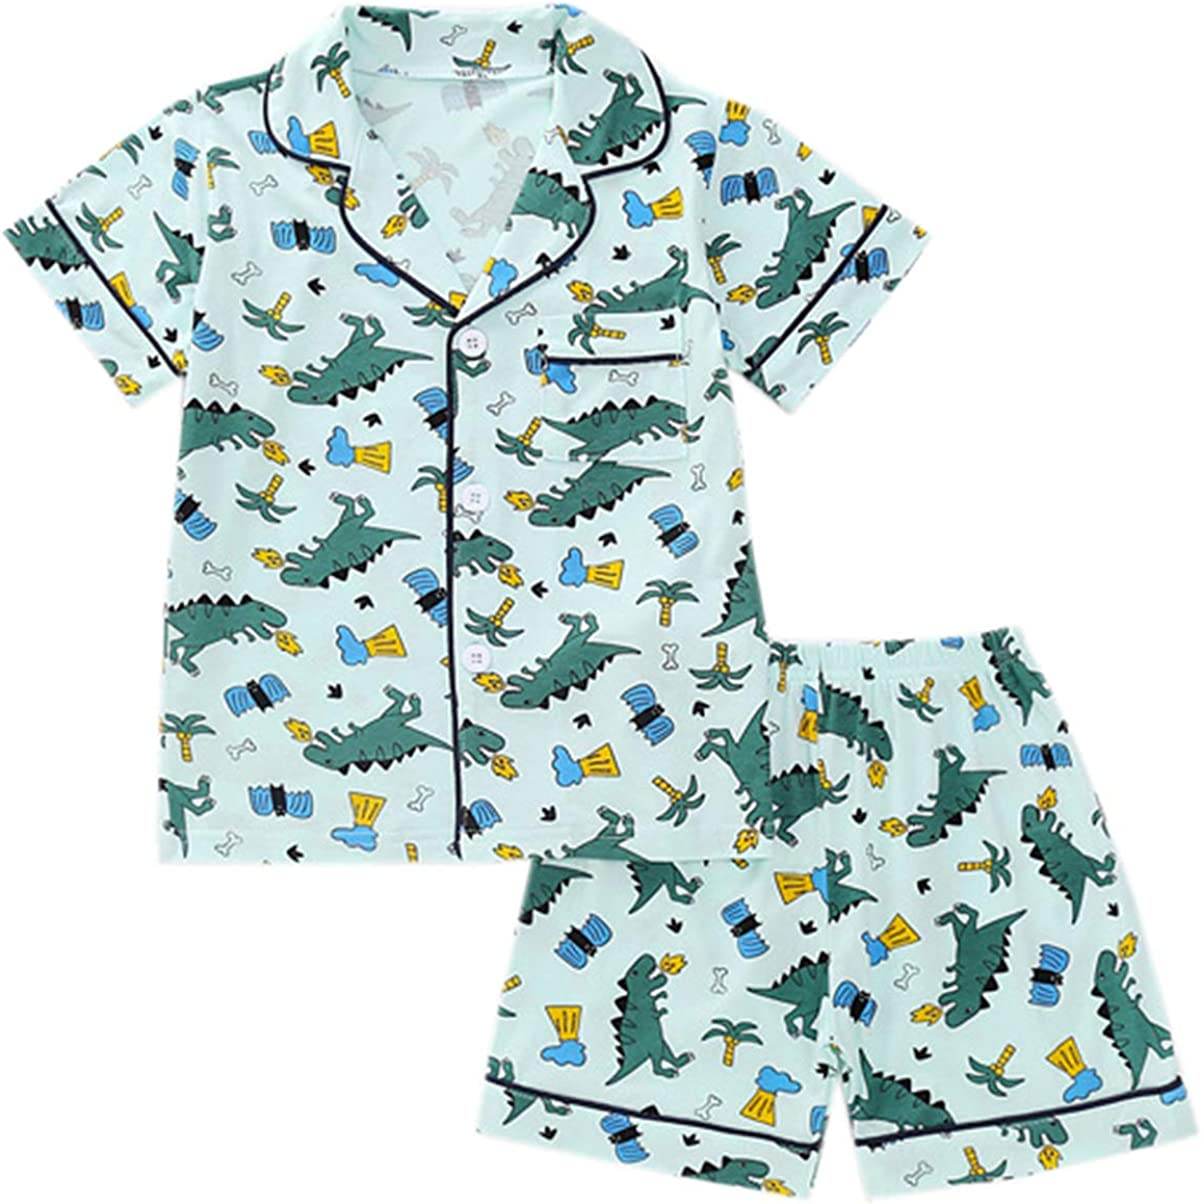 12 Months Betusline Kids Boys Girls Cartoon Pajamas Set 10 Years